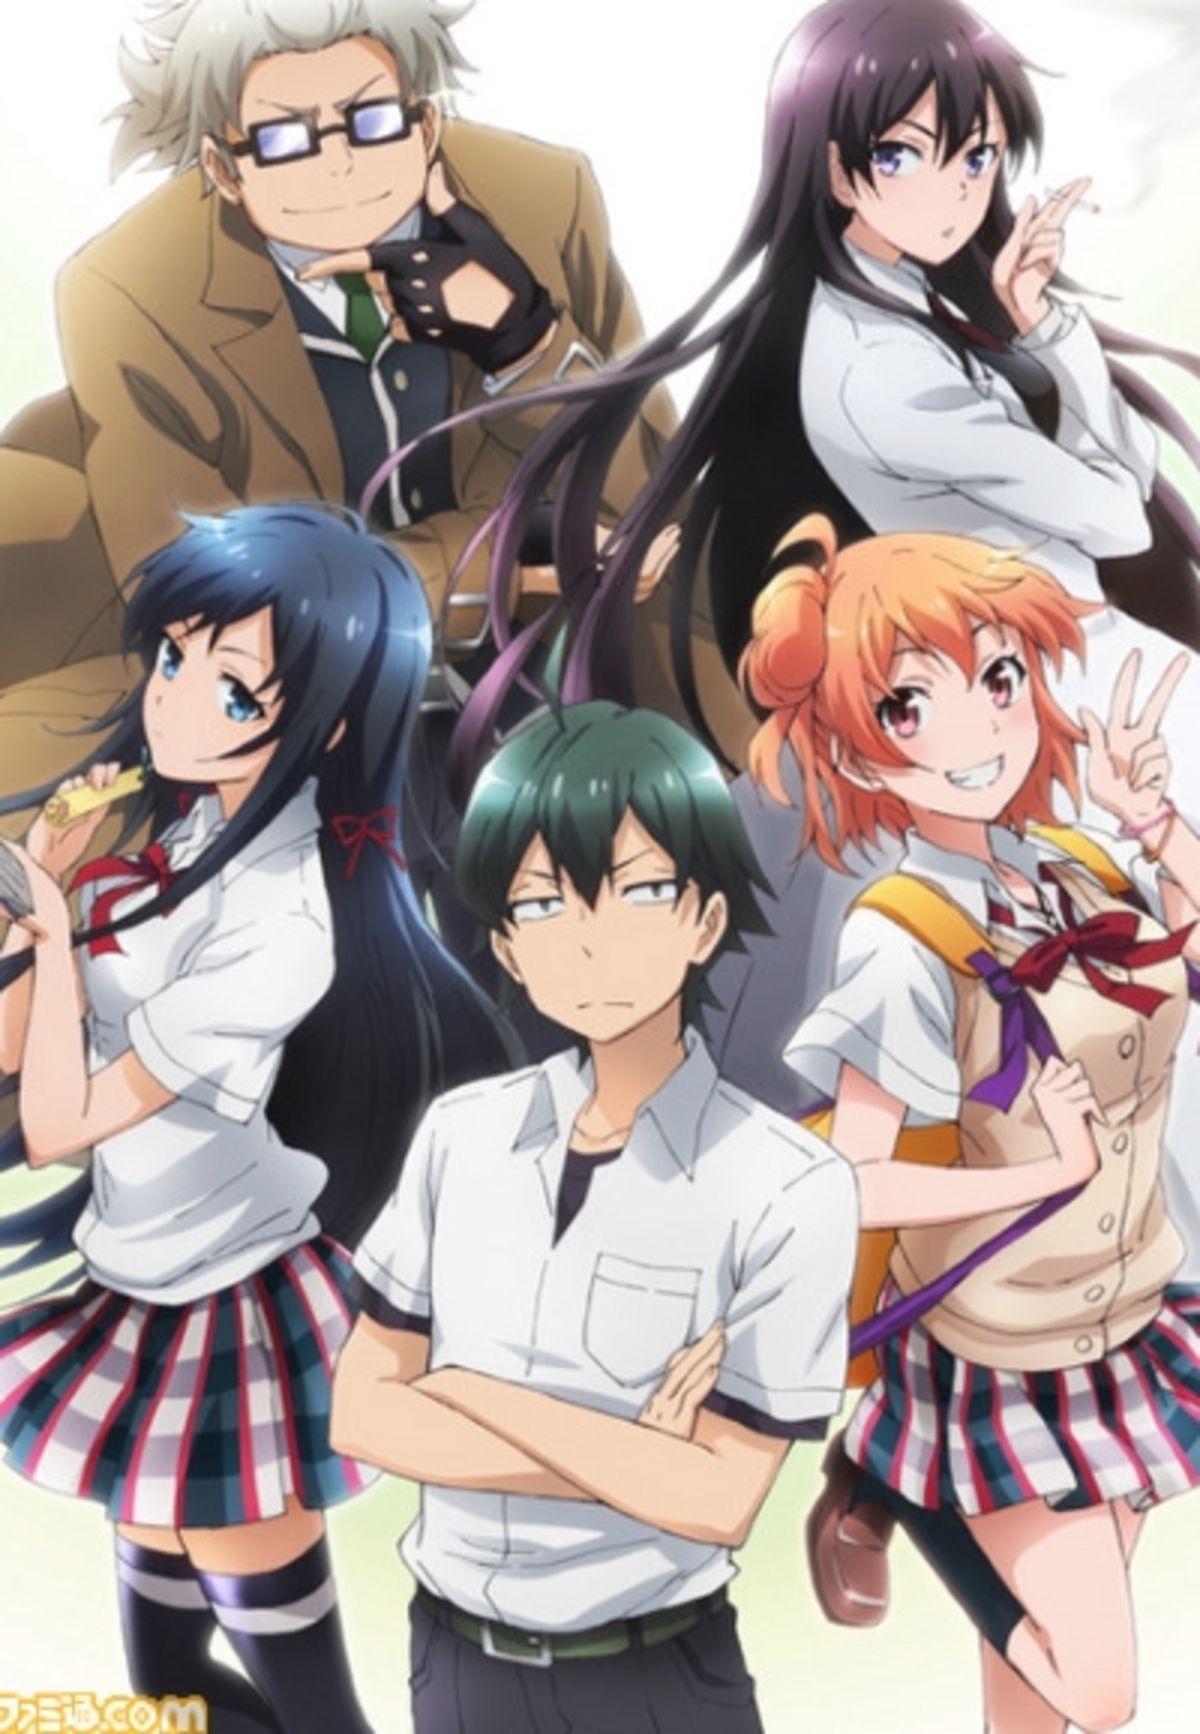 oregairu Anime, Anime love, Anime english